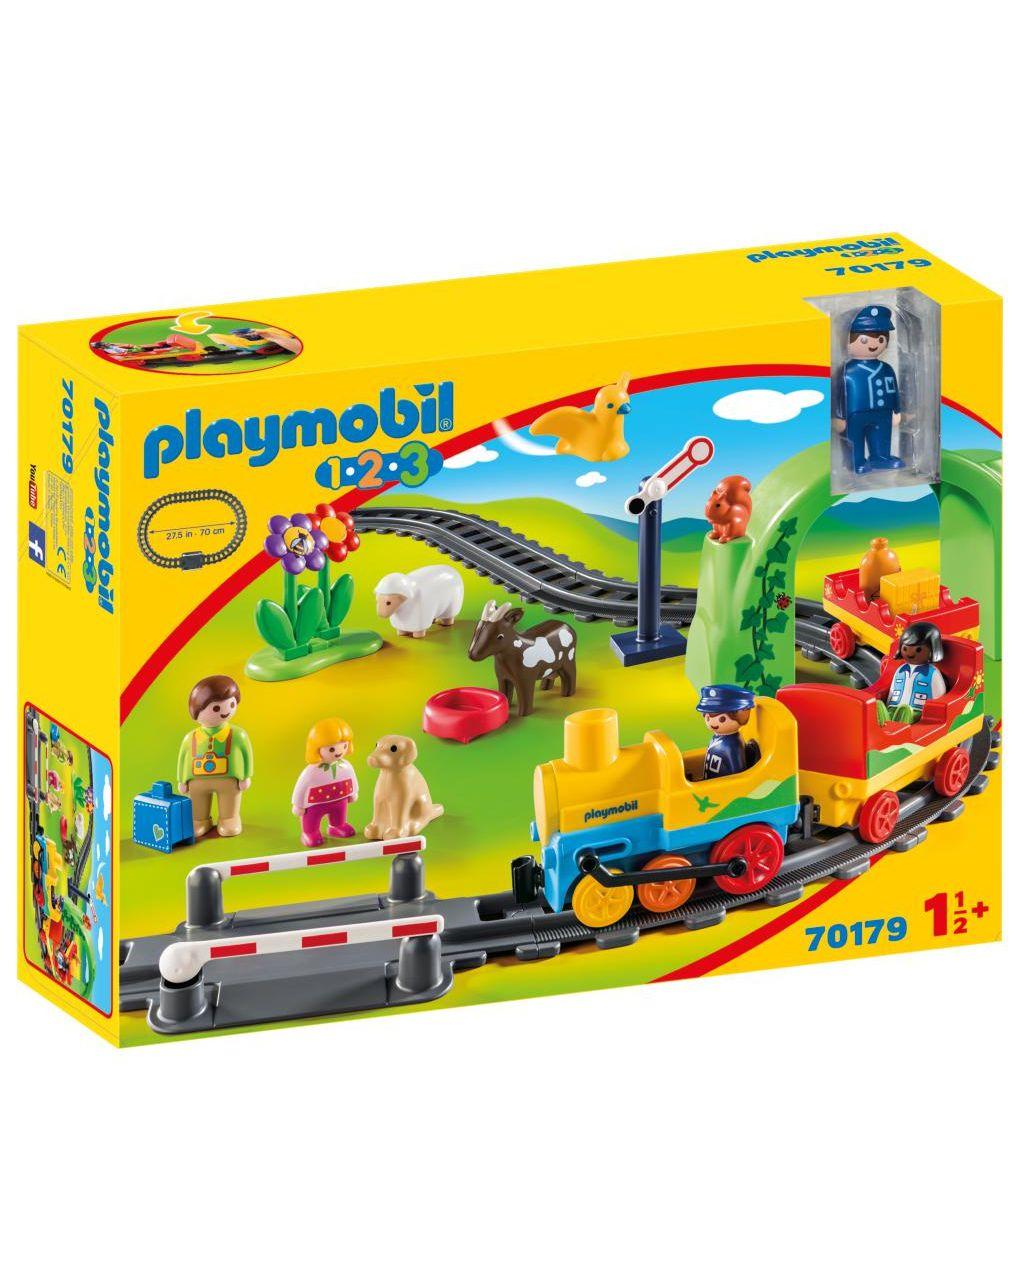 Playmobil 1.2.3 Σετ Τρένου Με Ζωάκια Και Επιβάτες 70179